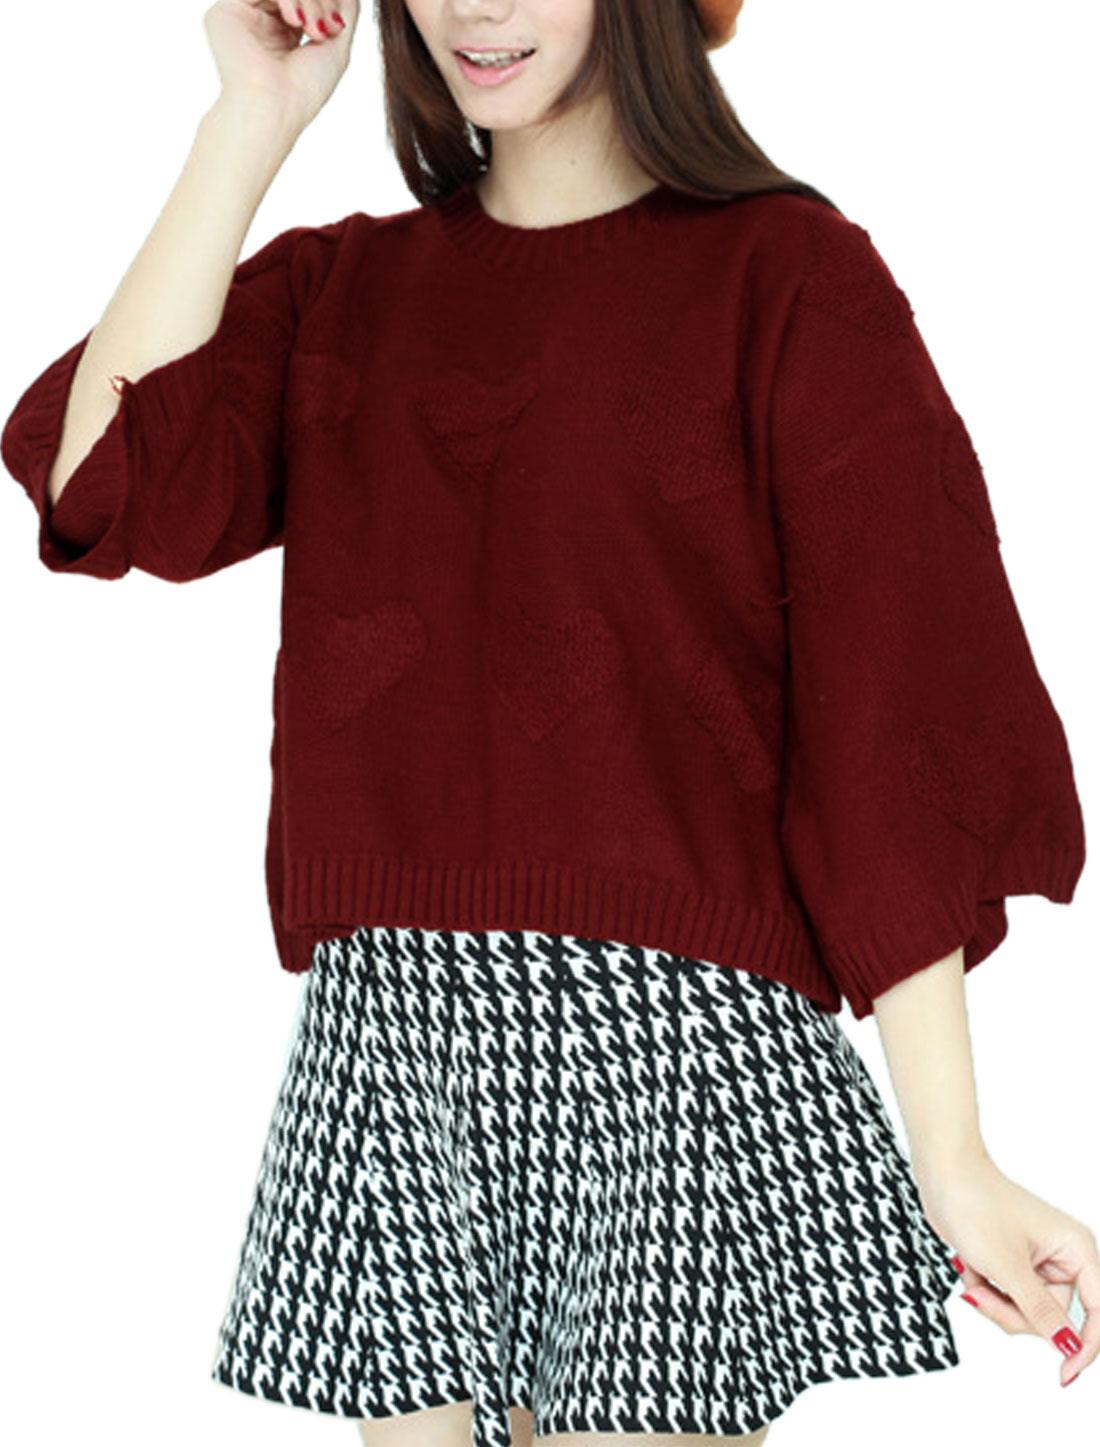 Ladies Burgundy Slipover Split Back Hearts Pattern 3/4 Sleeves Leisure Sweater S